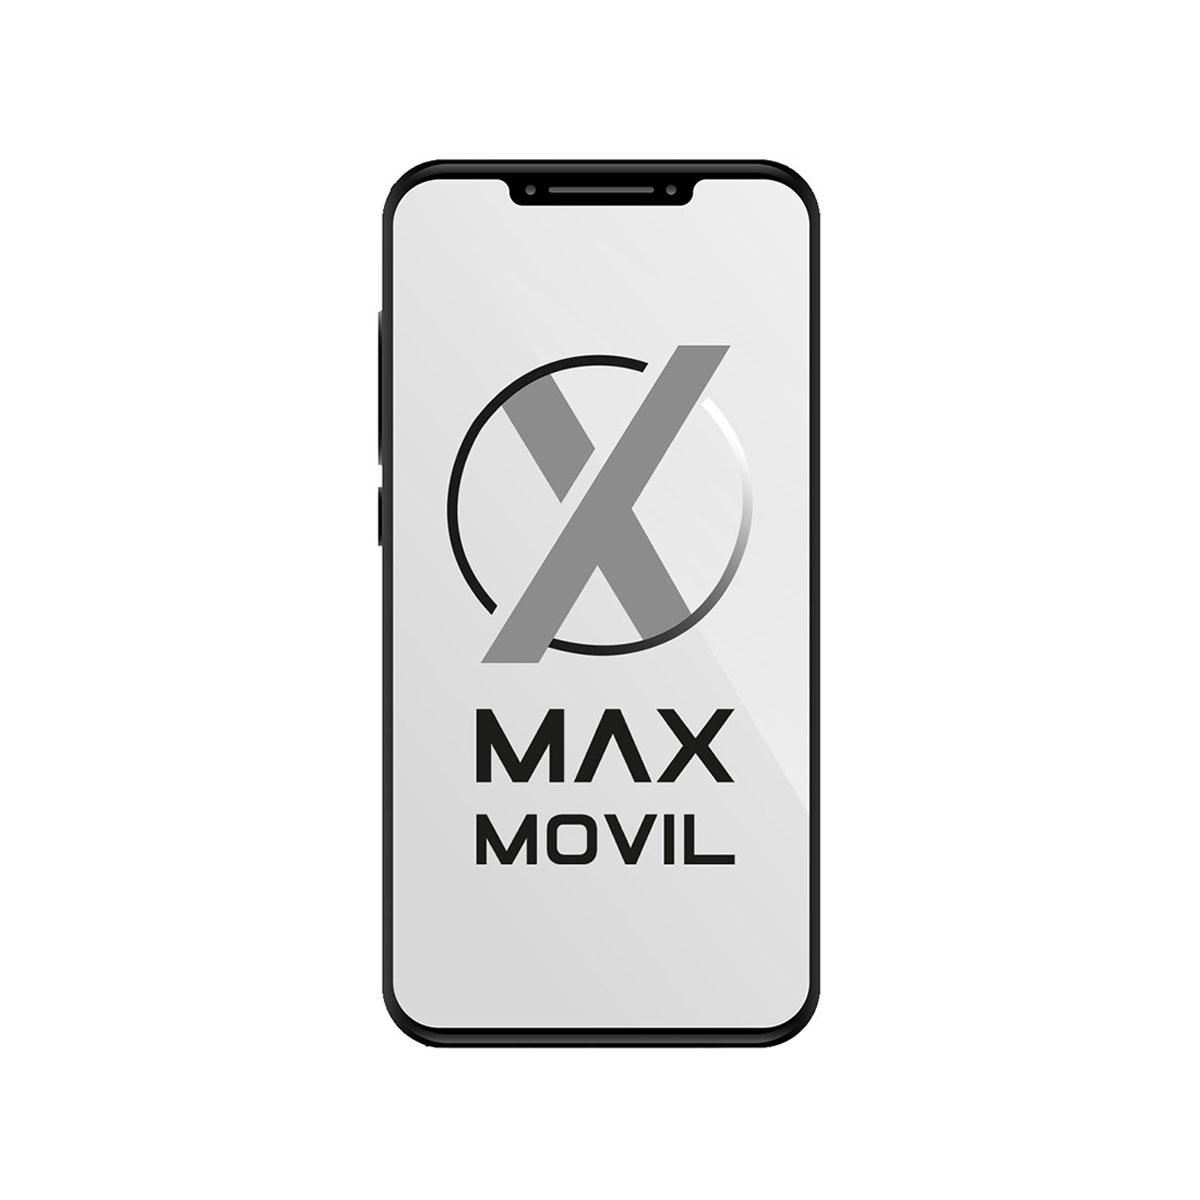 Comprar Xiaomi Redmi Note 8t 4gb 128gb Gris Envío Urgente Maxmovil